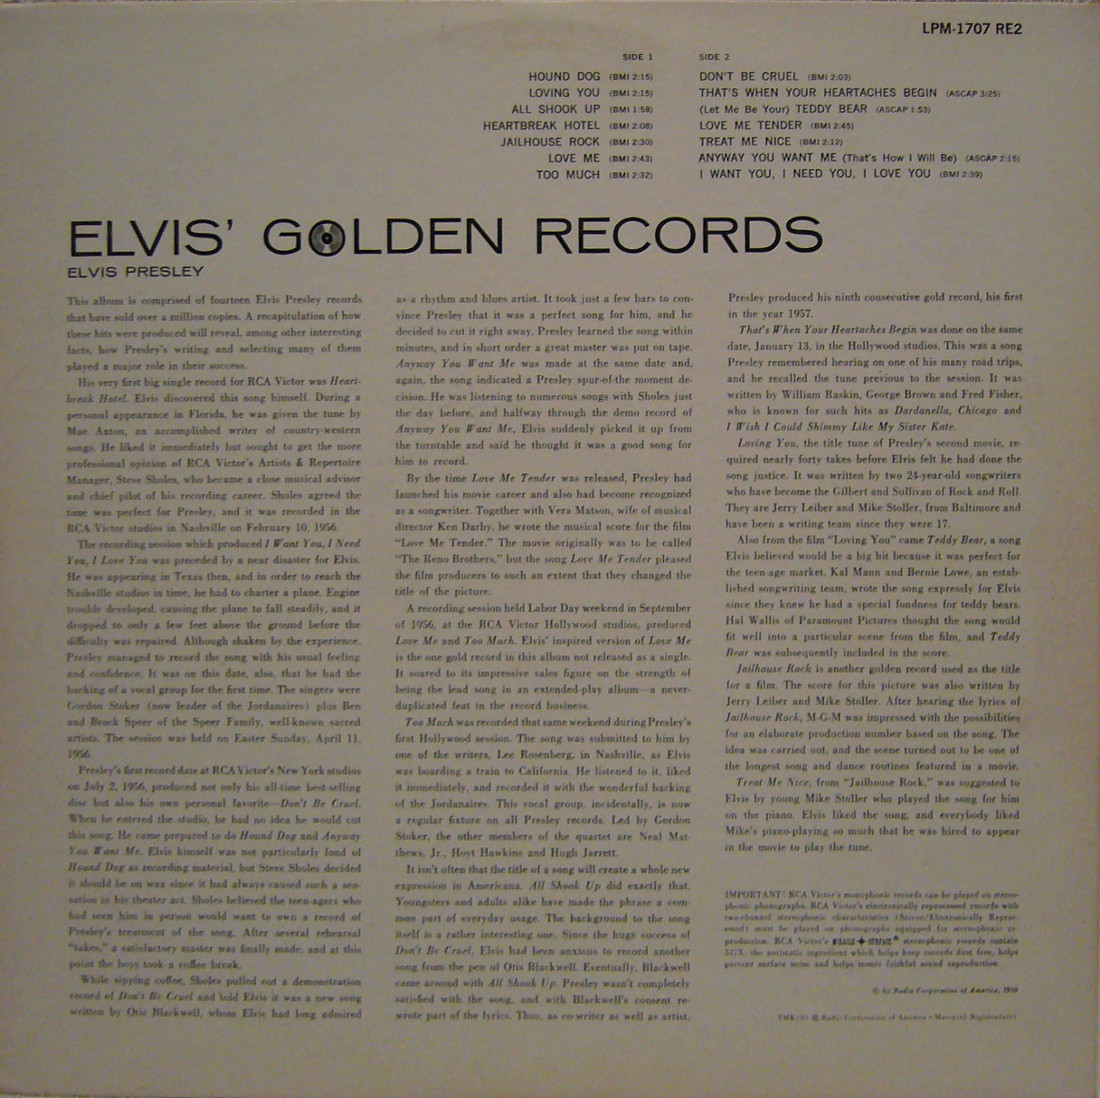 ELVIS' GOLD RECORDS  Lpm1707re2bb1pyt